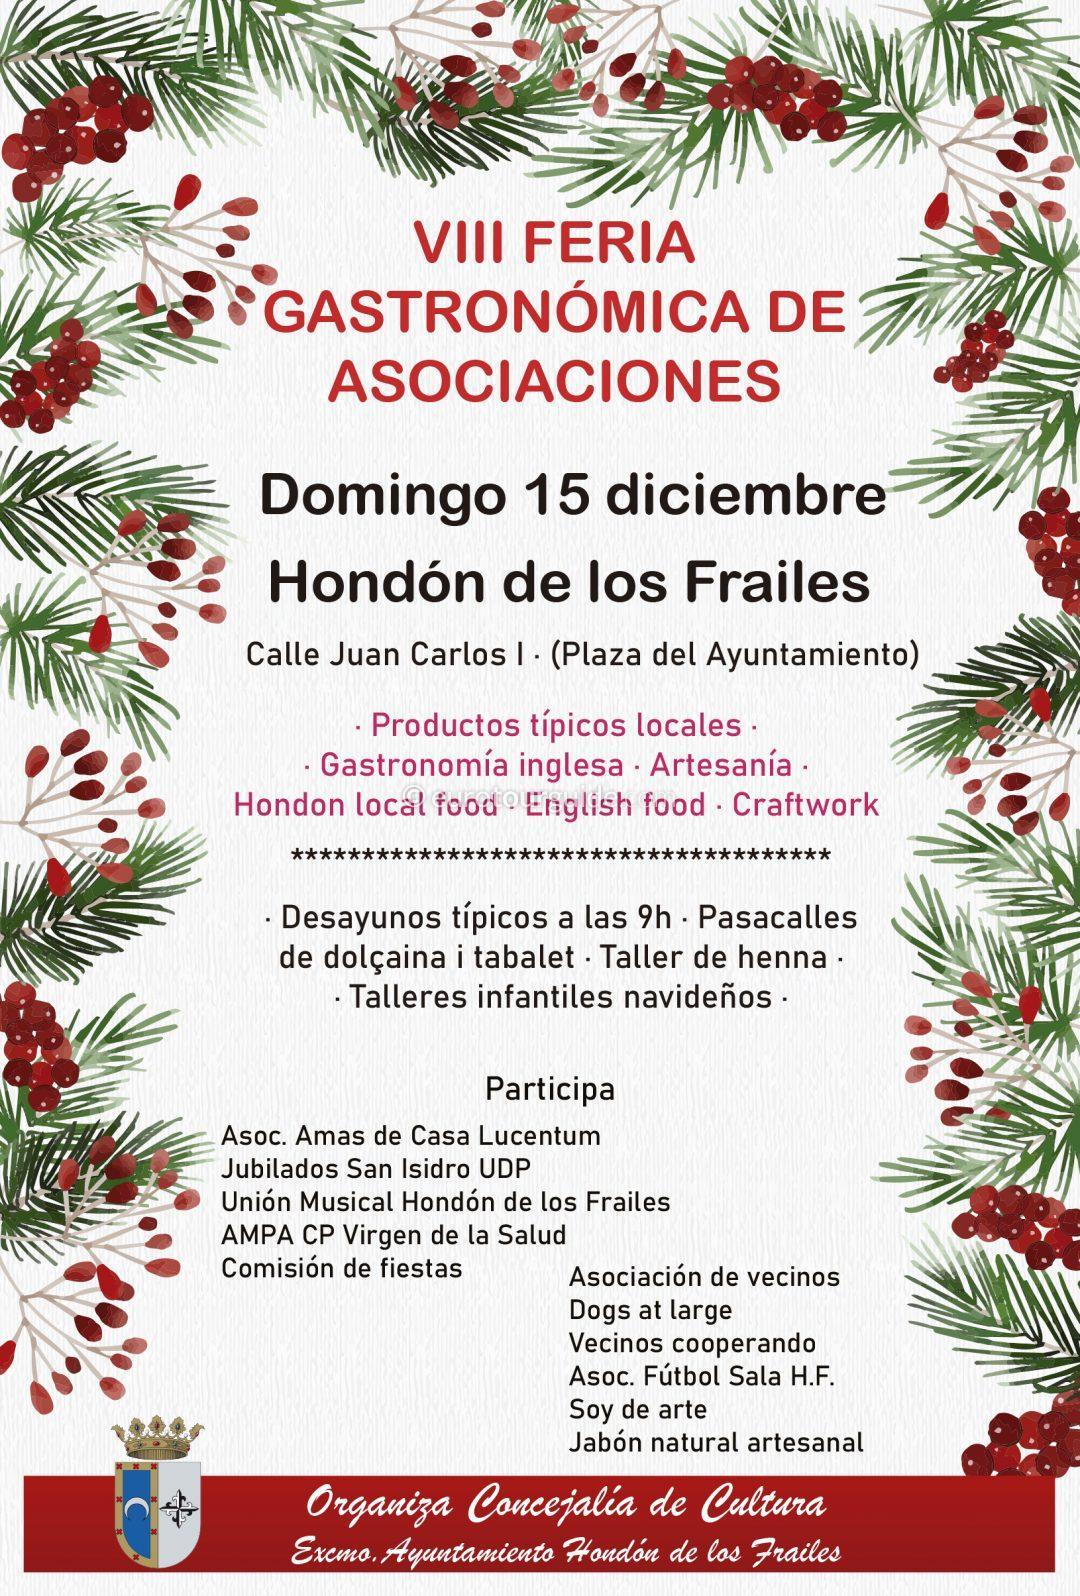 Hondon de los Frailes Gastronomic Fair 14th December 2019